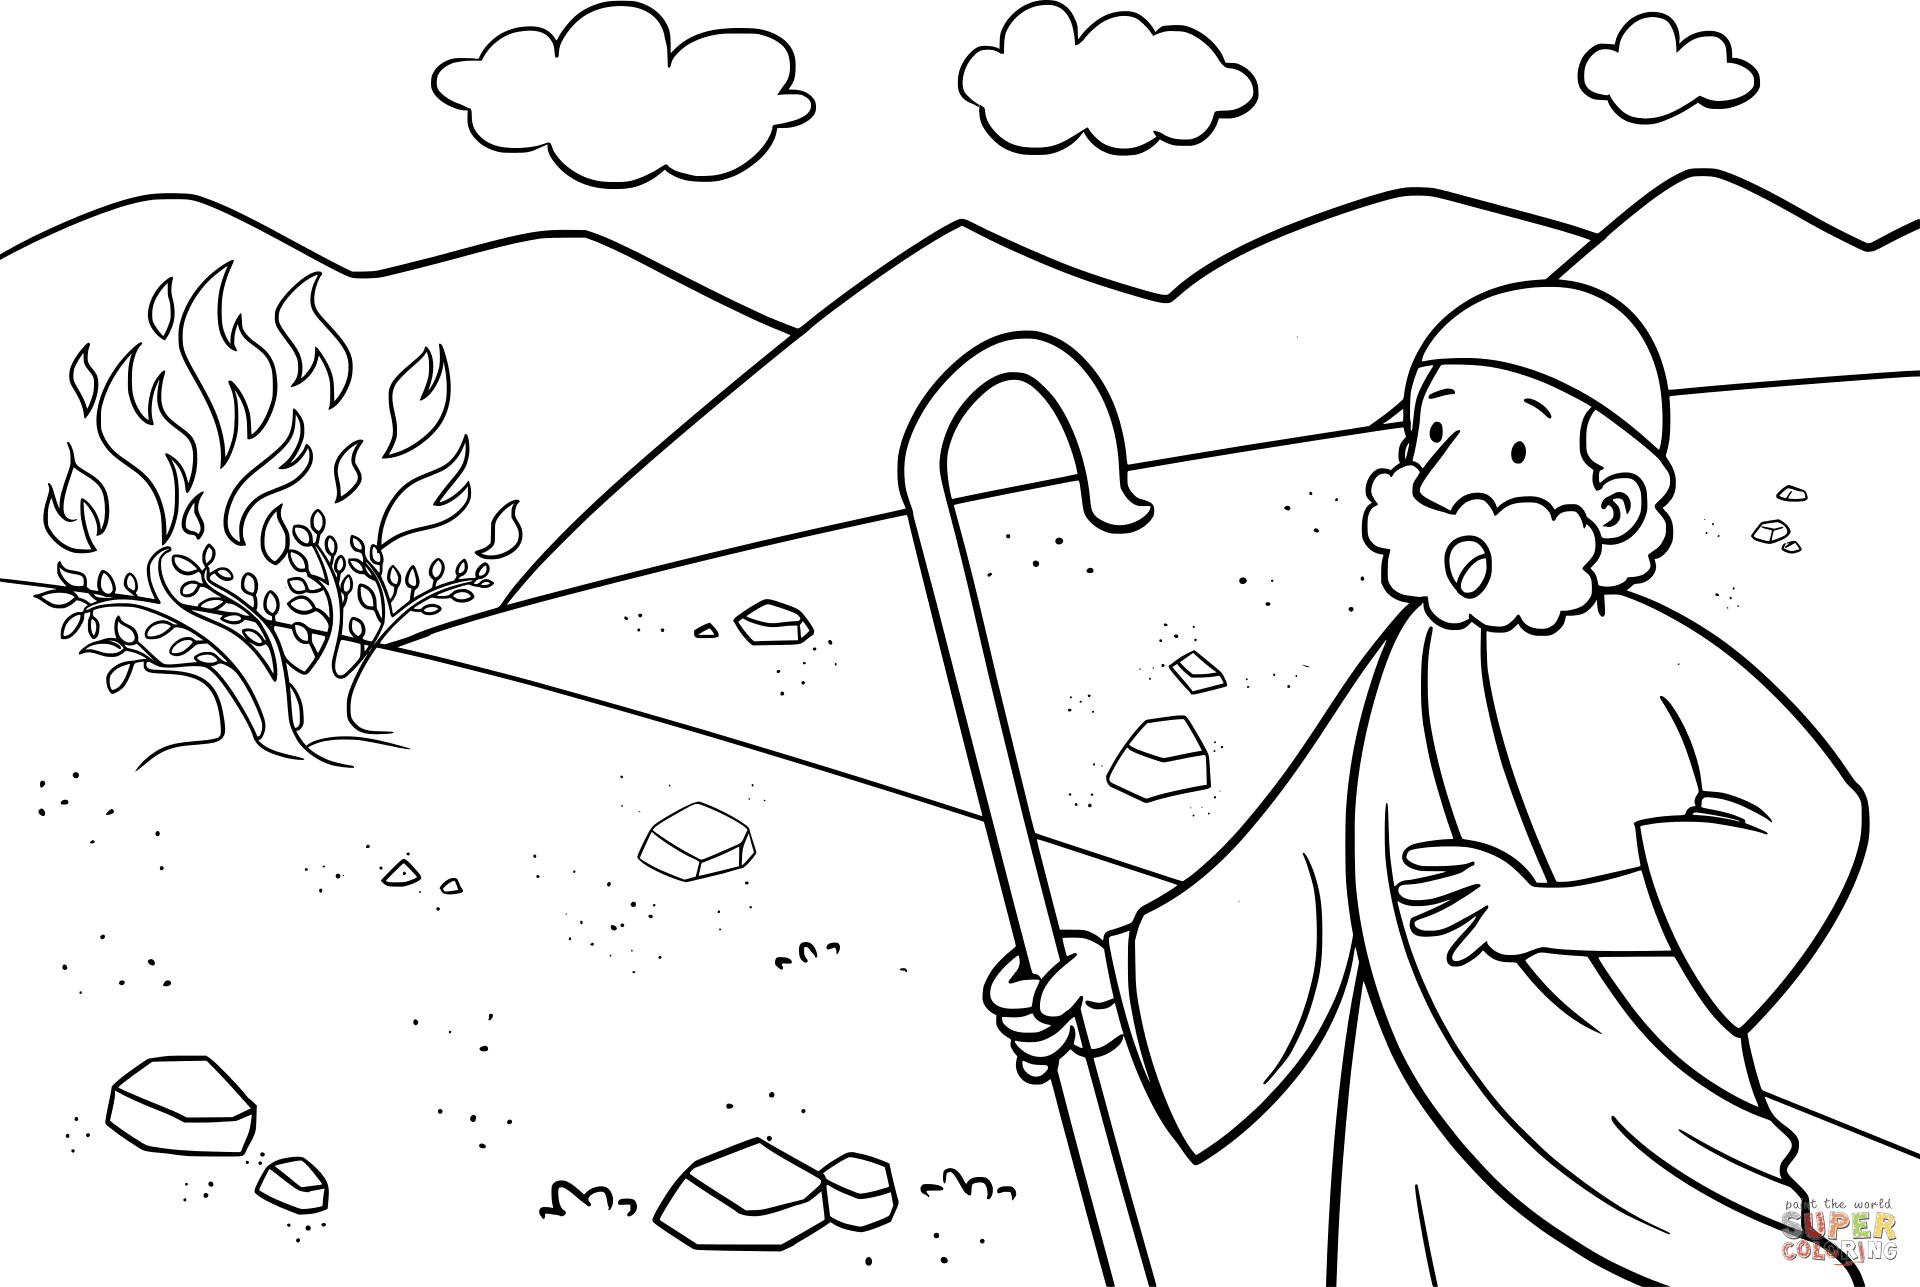 Moses & the Burning Bush coloring page   Free Printable ...